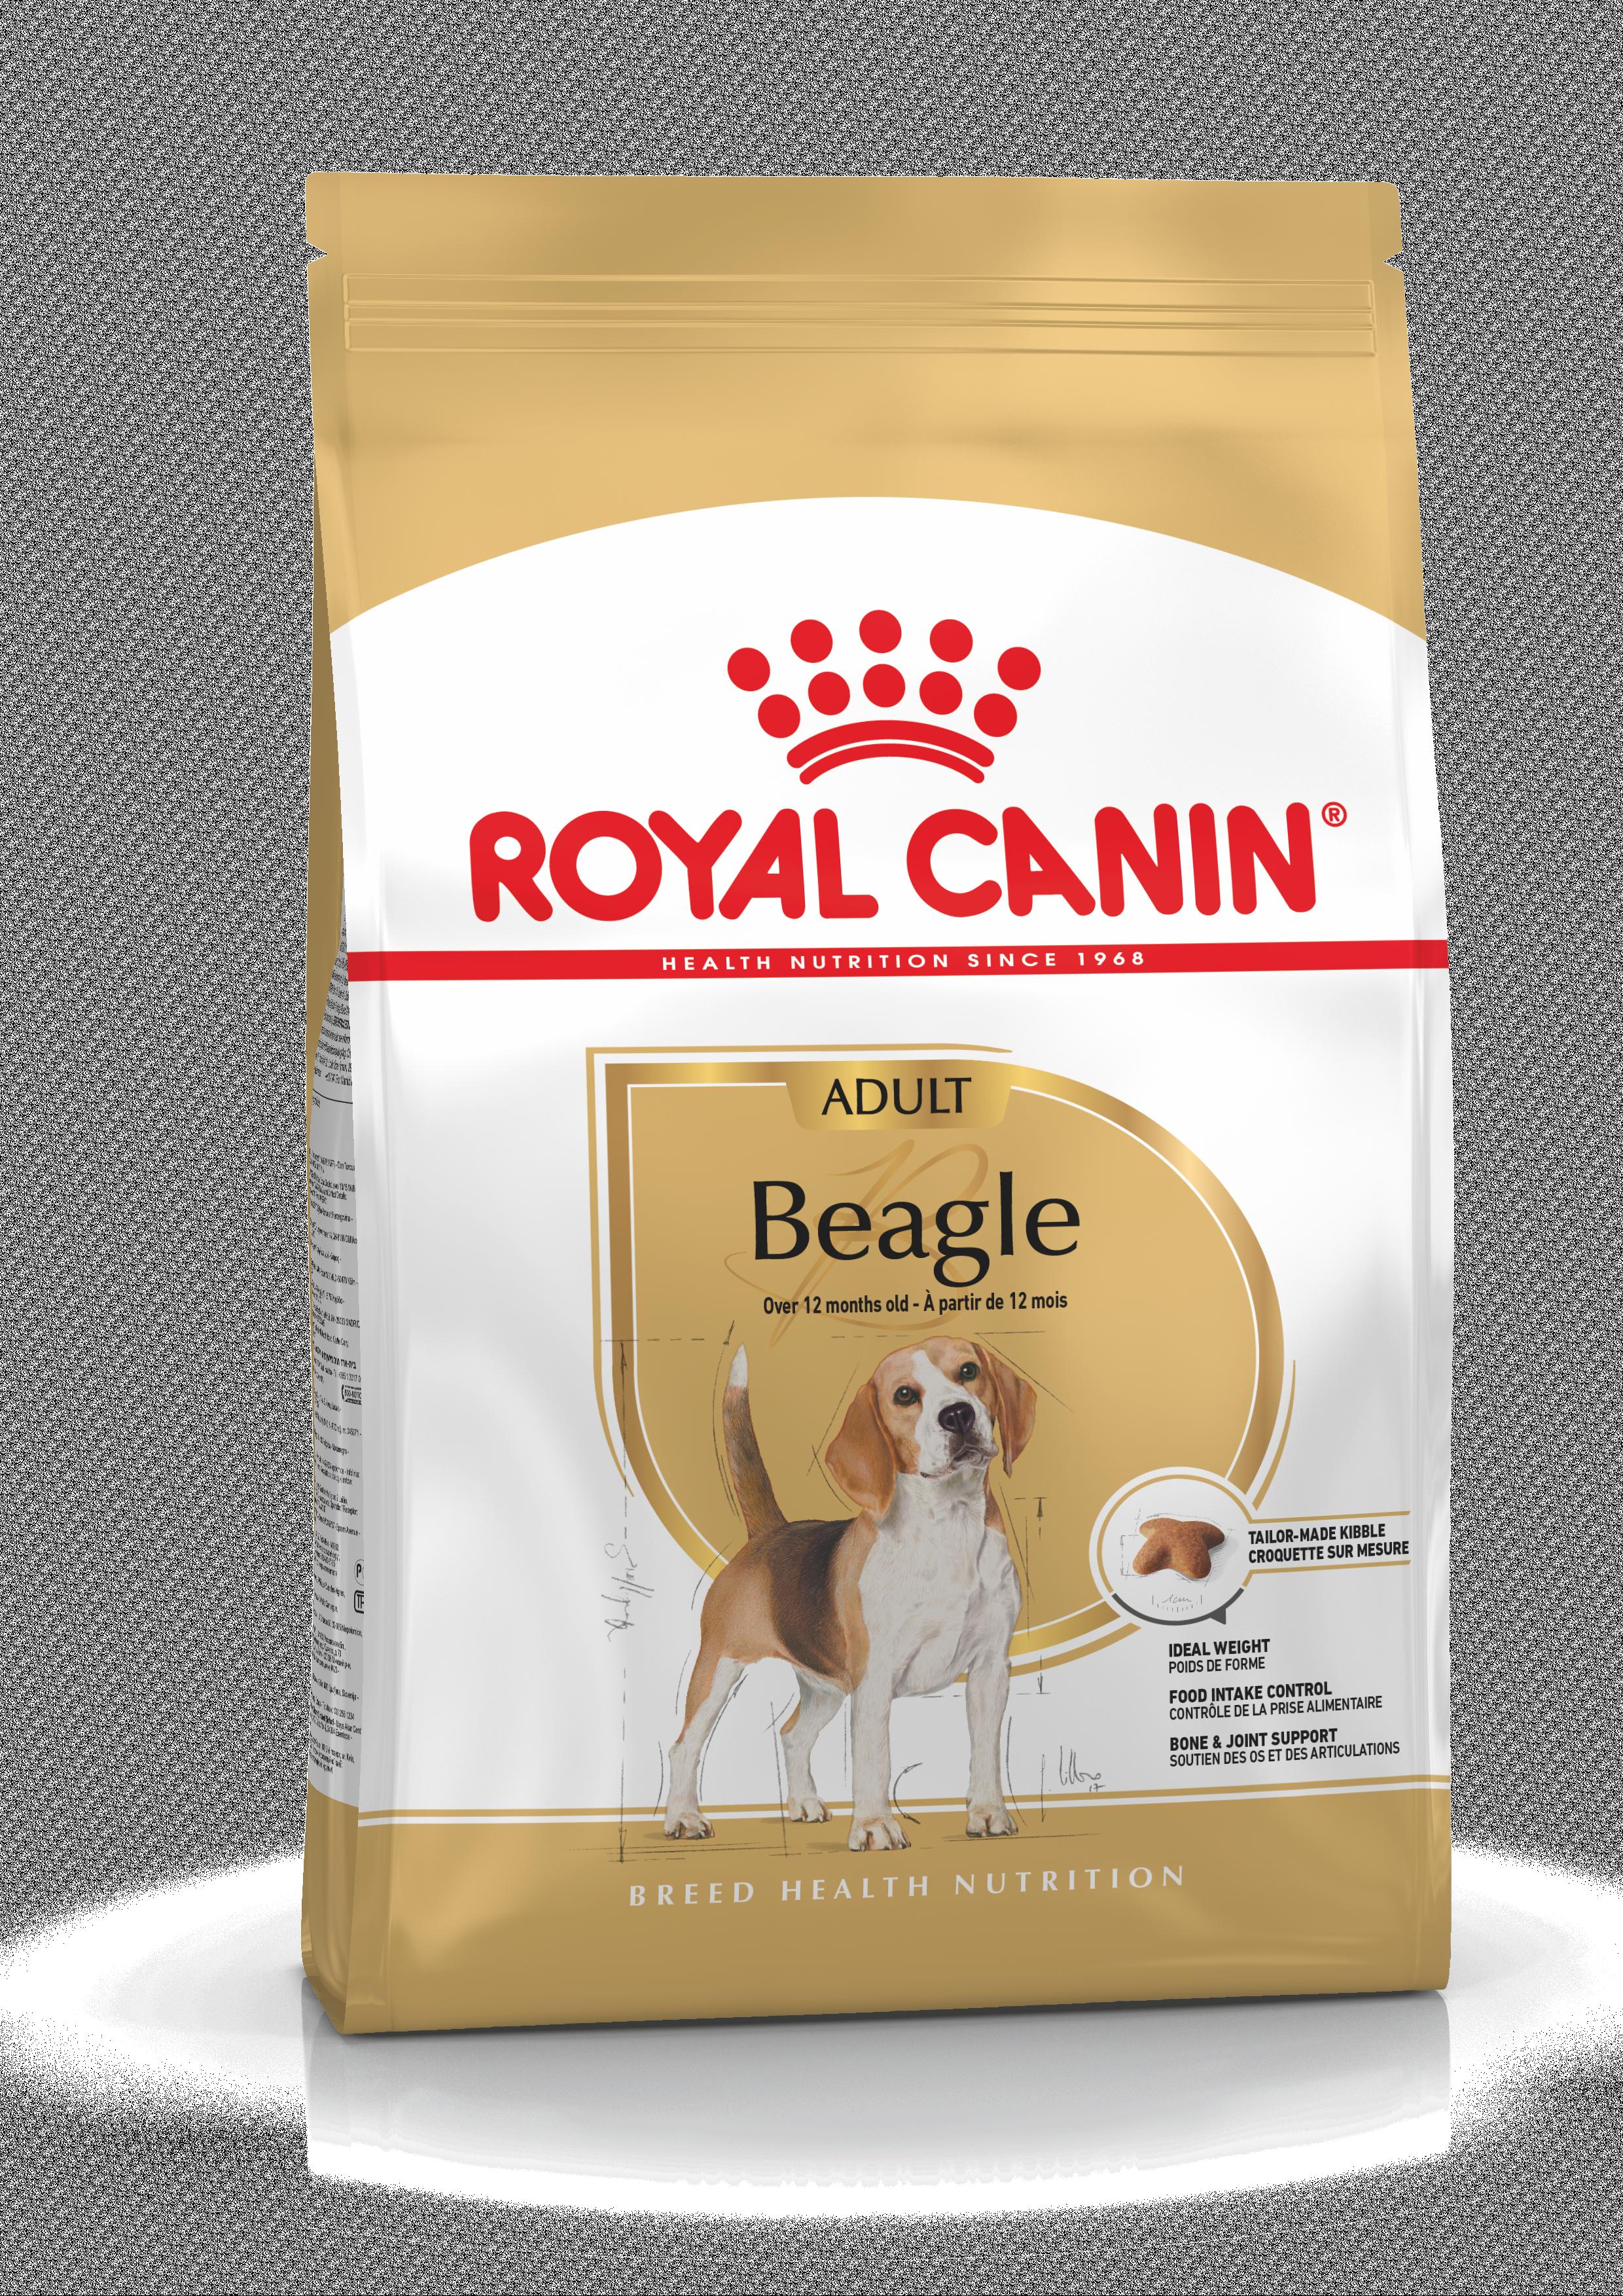 Beagle Adult Kering Royal Canin